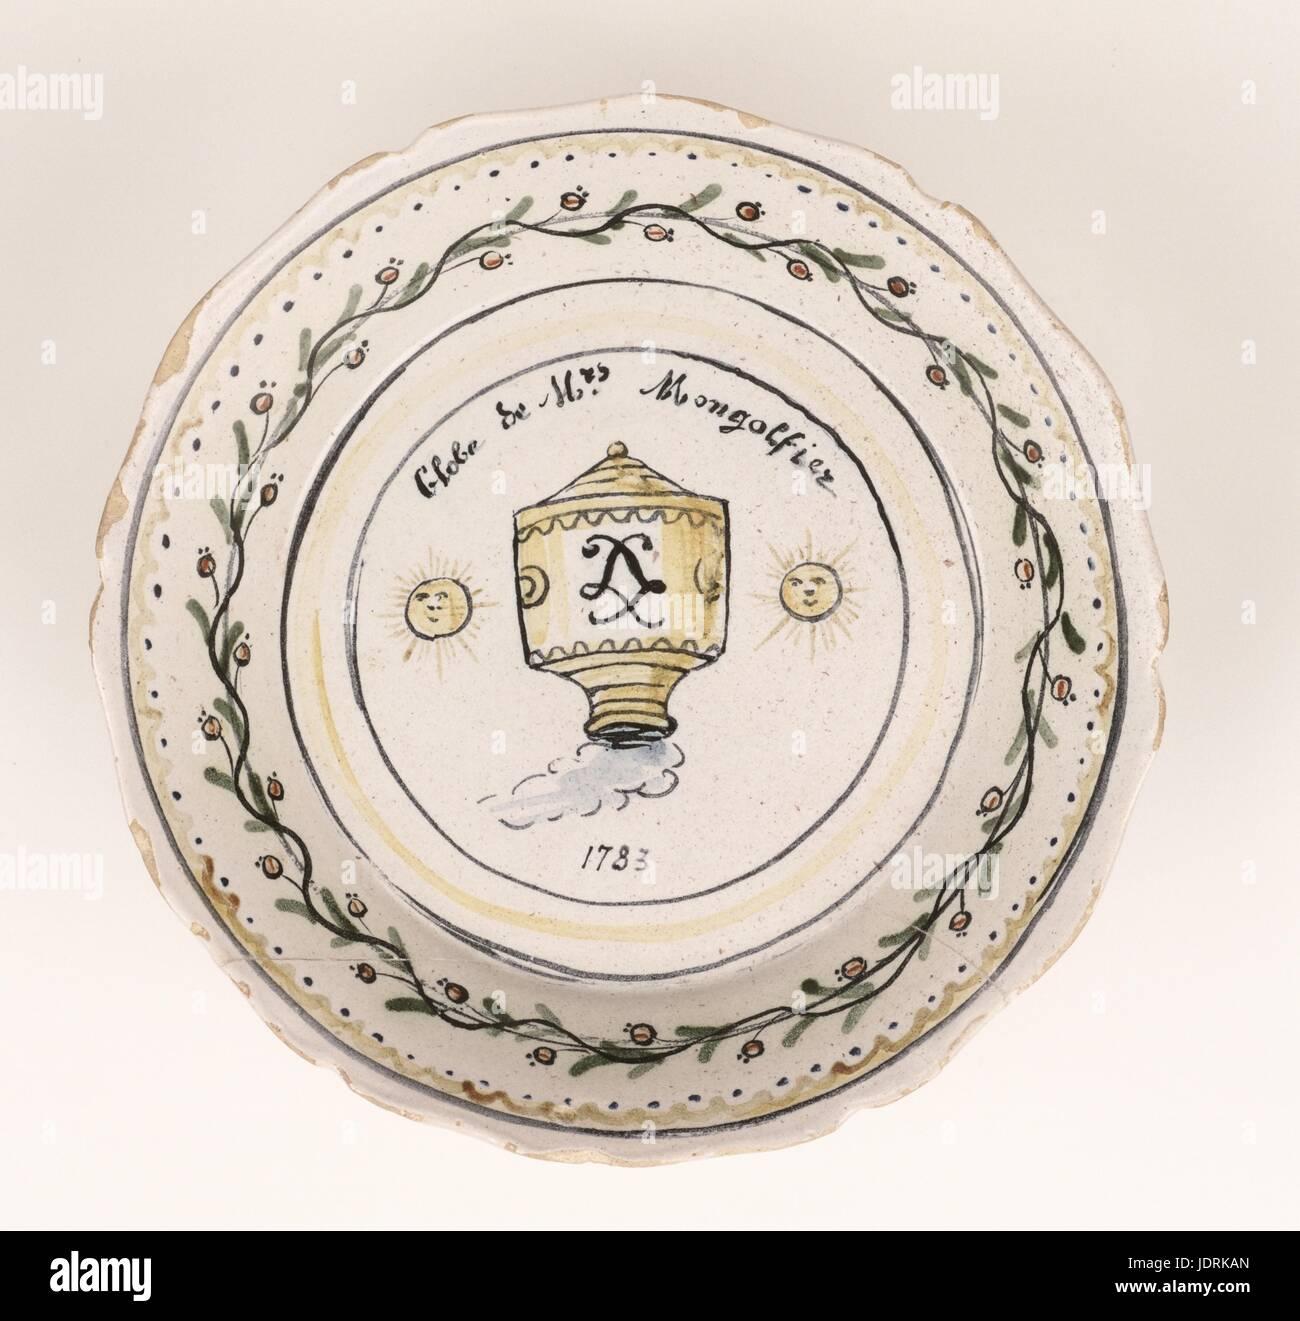 Platte mit Fayencen aus Nevers Frau Montgolfier-Ballon, 1783 18 Jahrhundert neu im 20. Jahrhundert Durchmesser 23 Stockbild